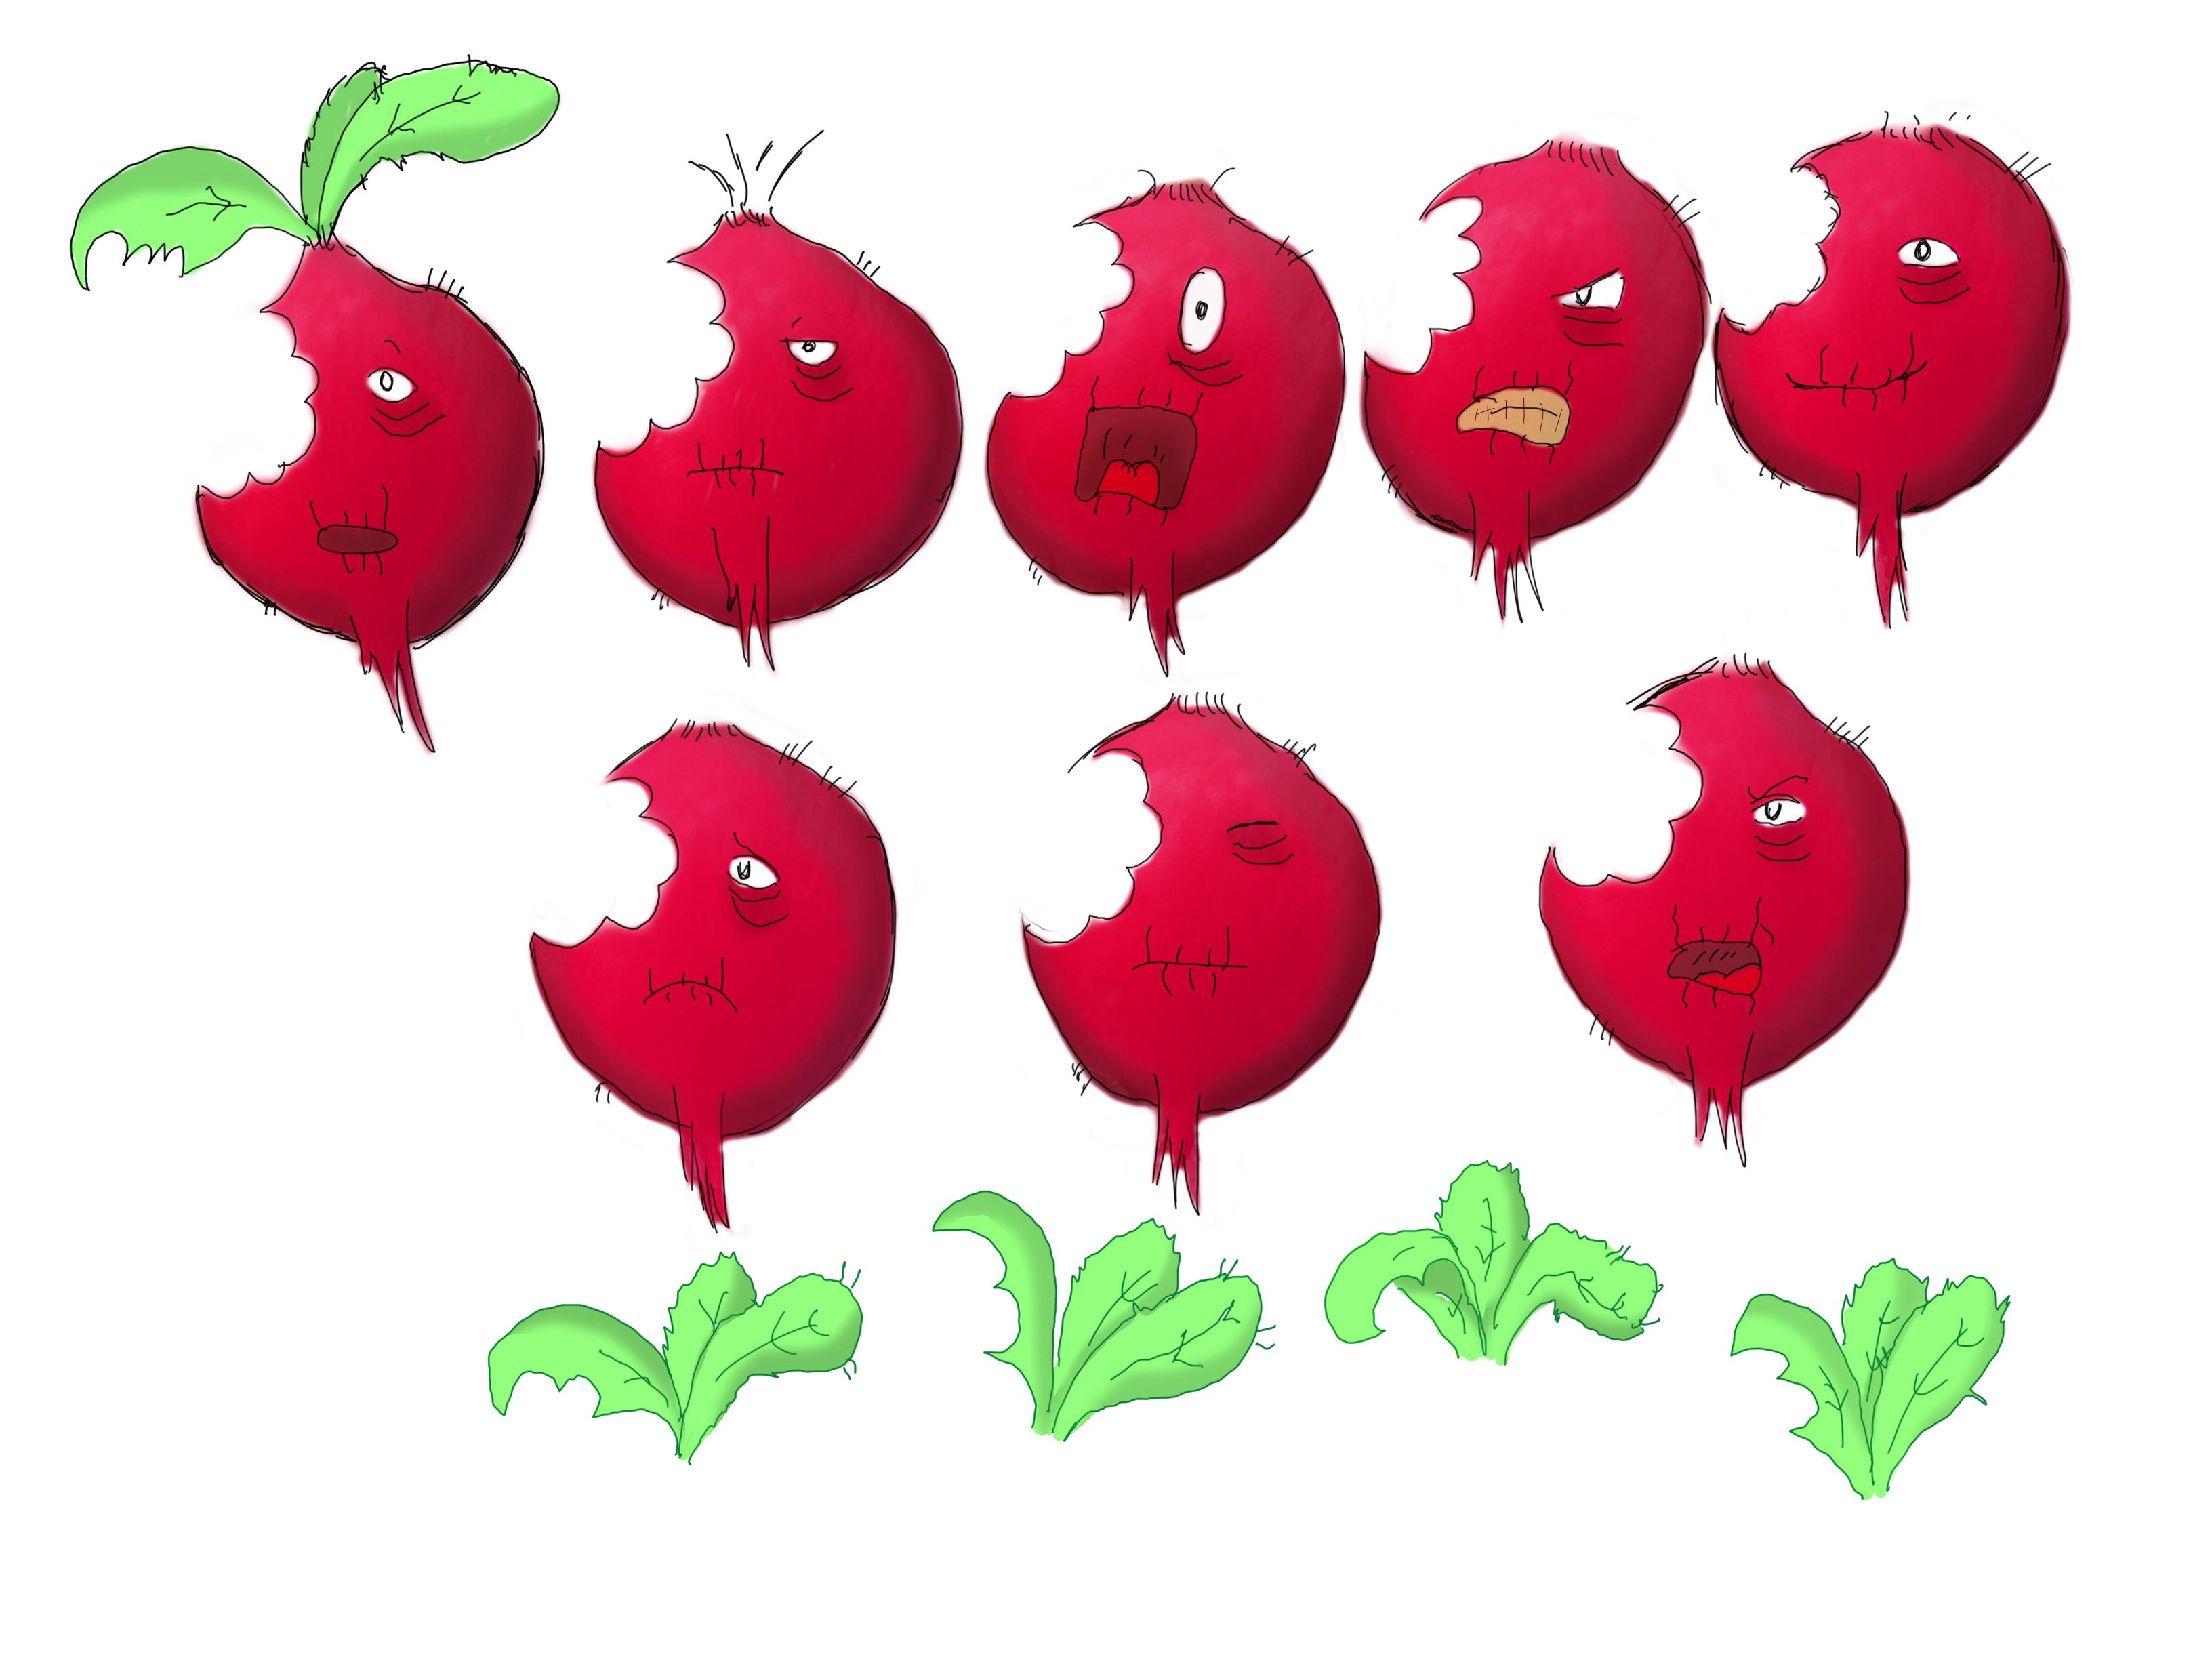 Radish expressions